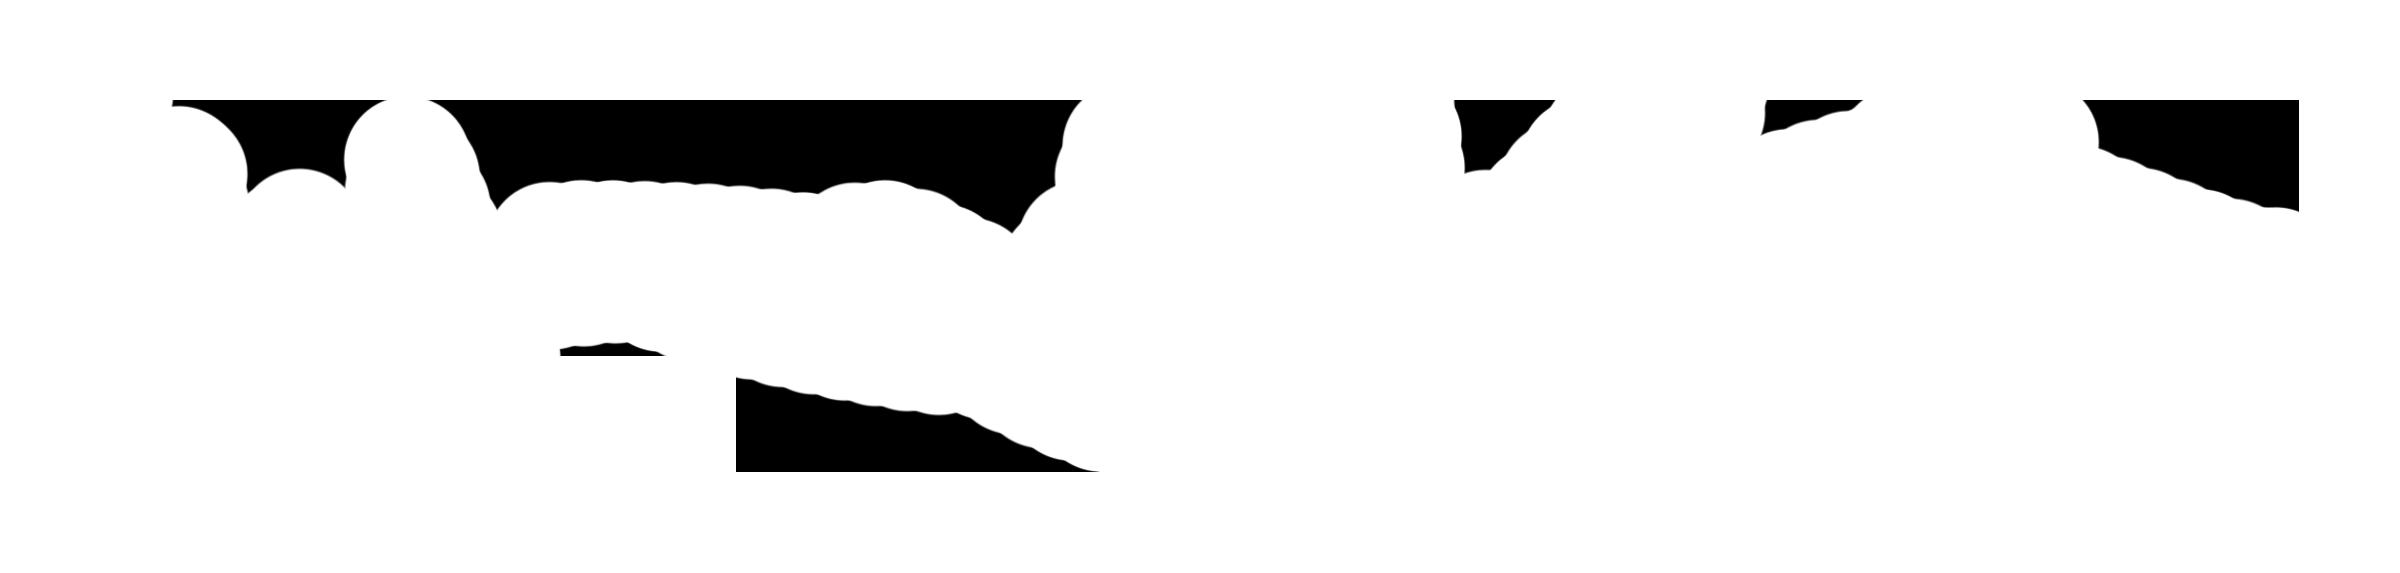 lululemon-logo-black-and-white copy.png